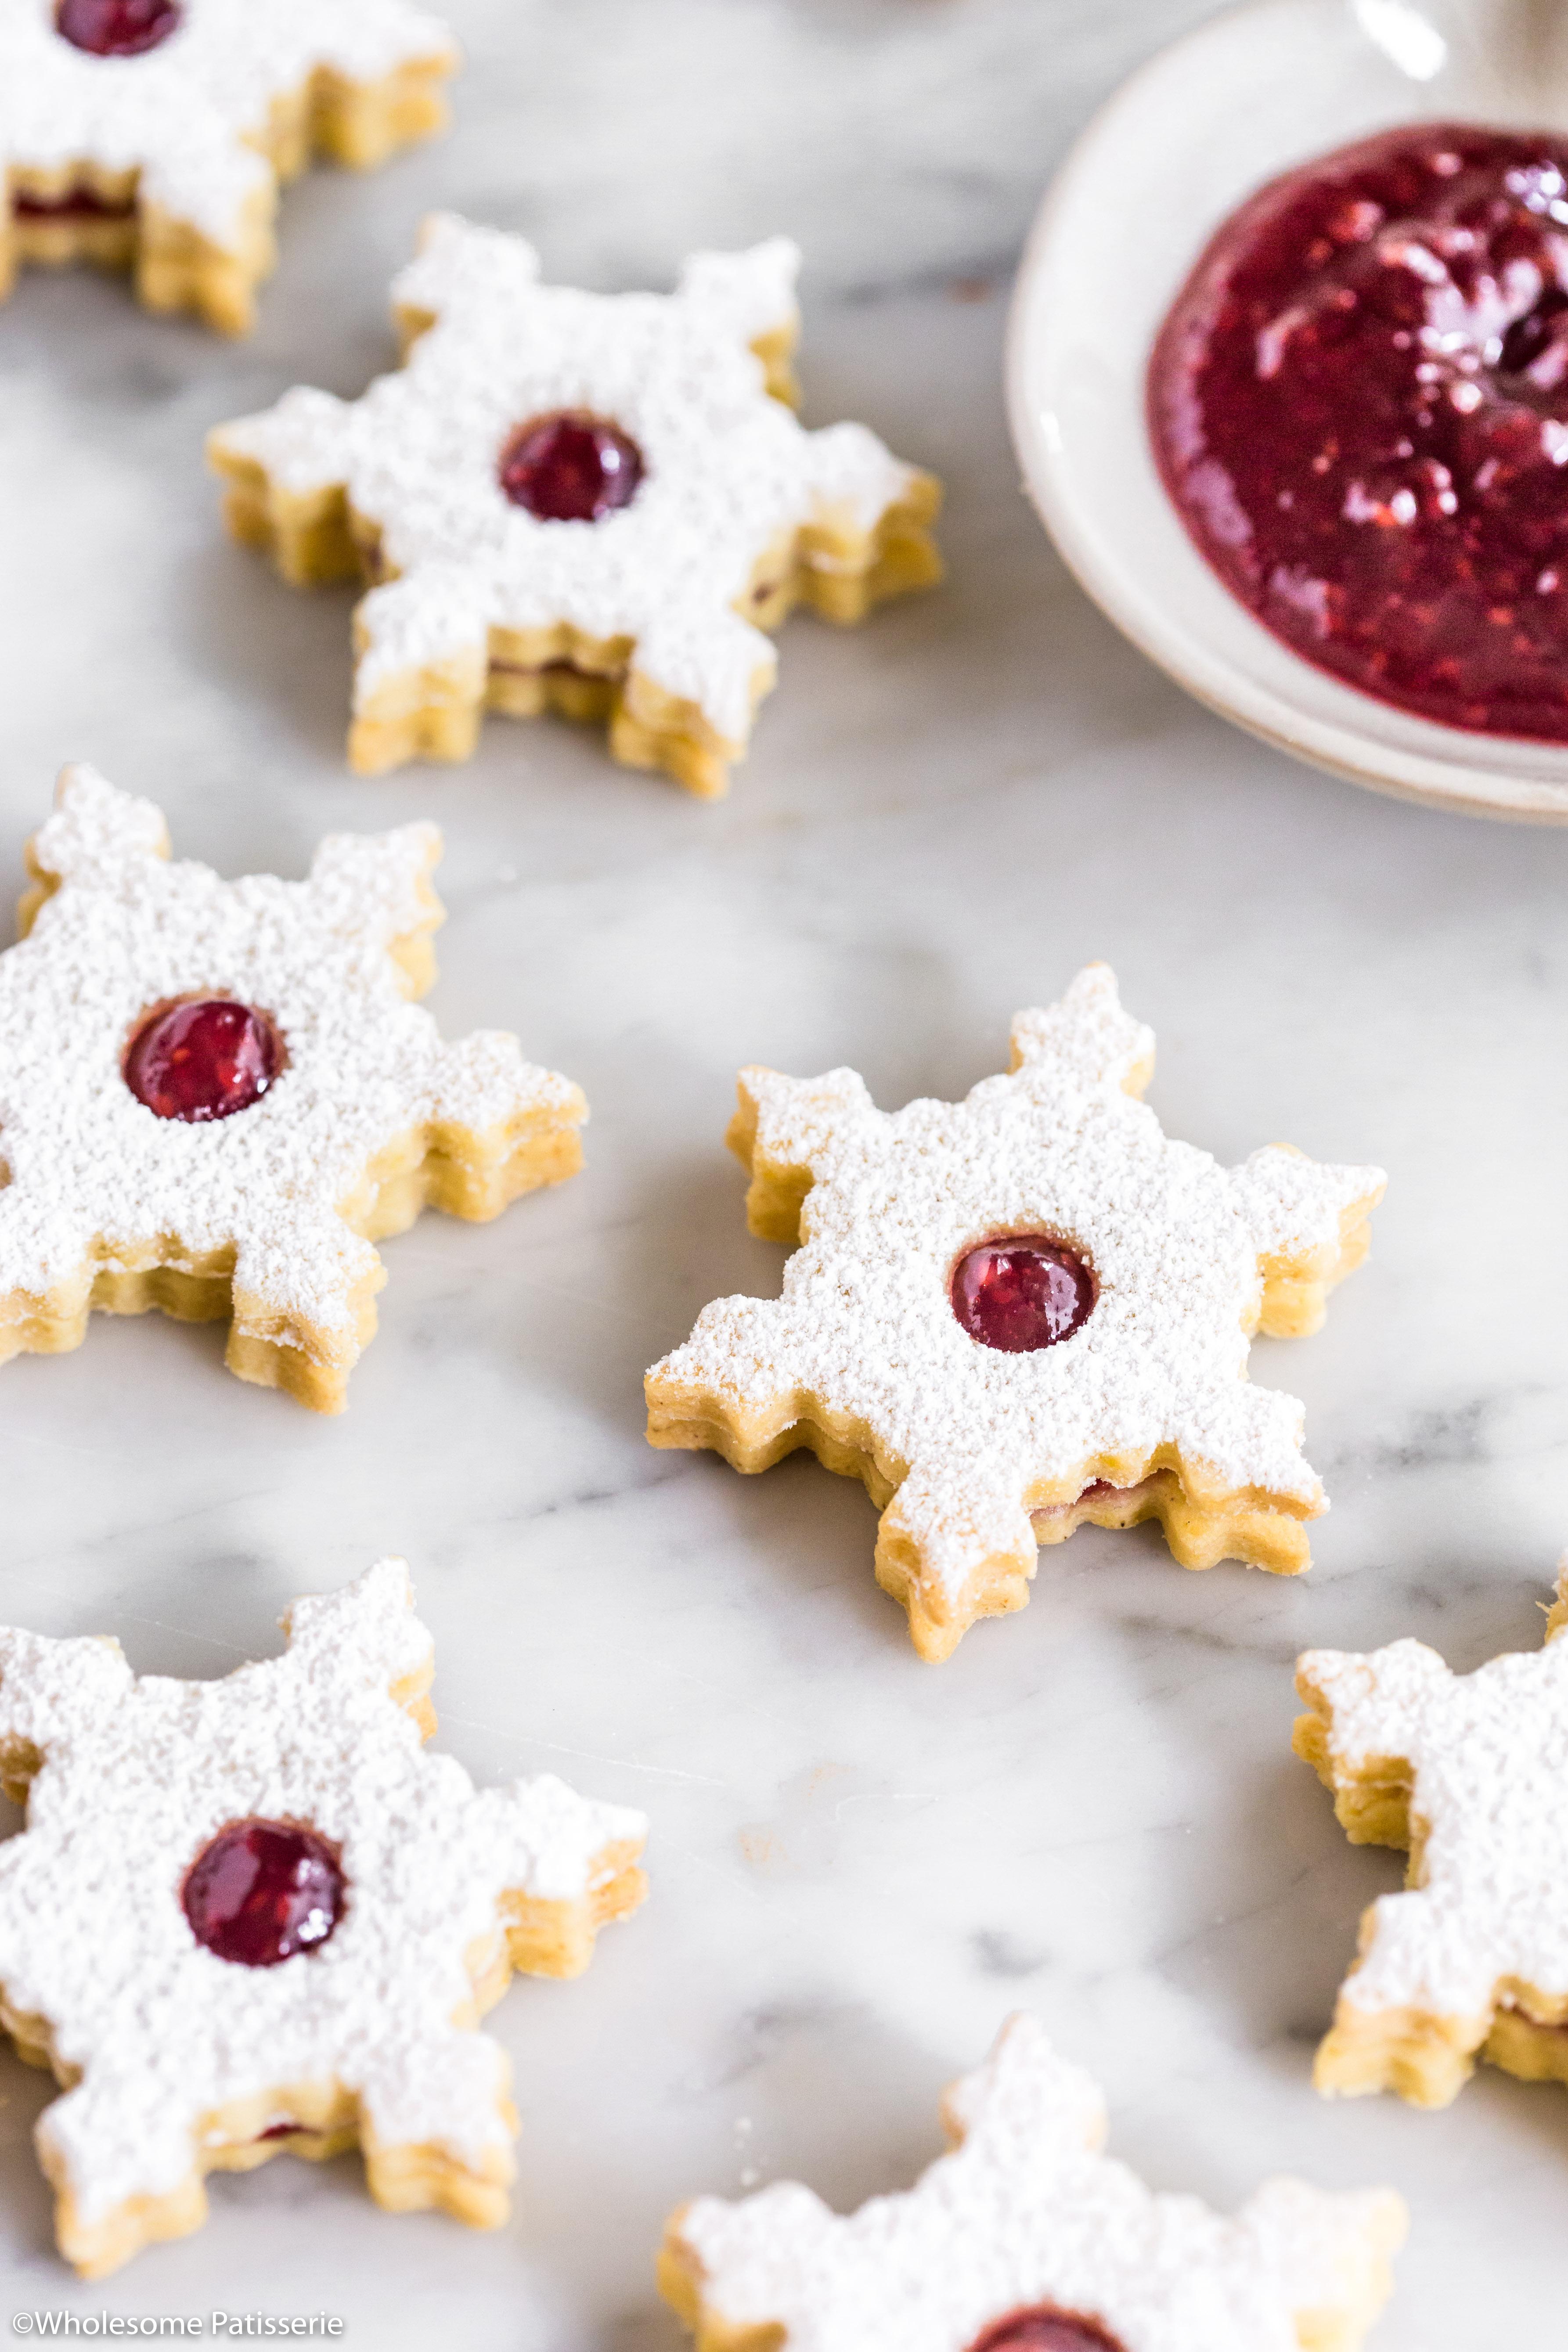 Linzer Cookies Christmas Cookies Baking Holidays Festive Jam Gluten